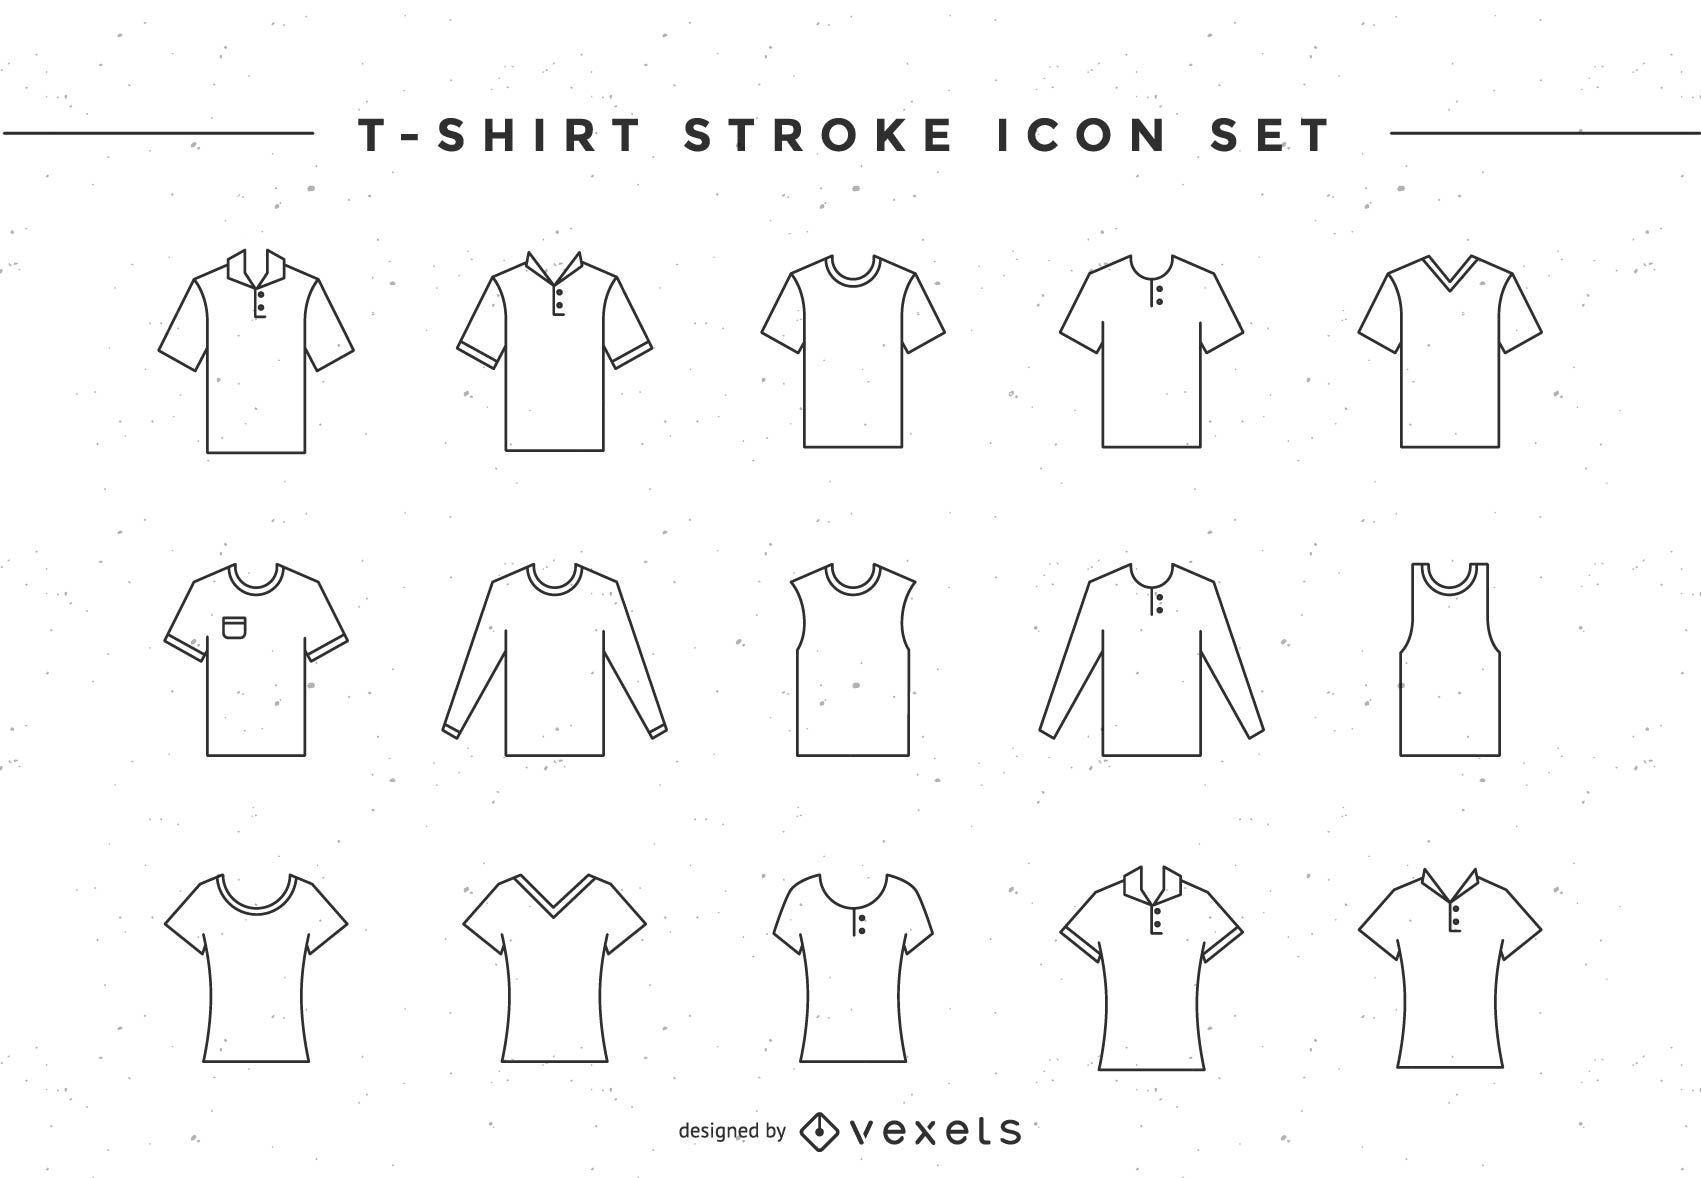 T-shirt stroke icon set